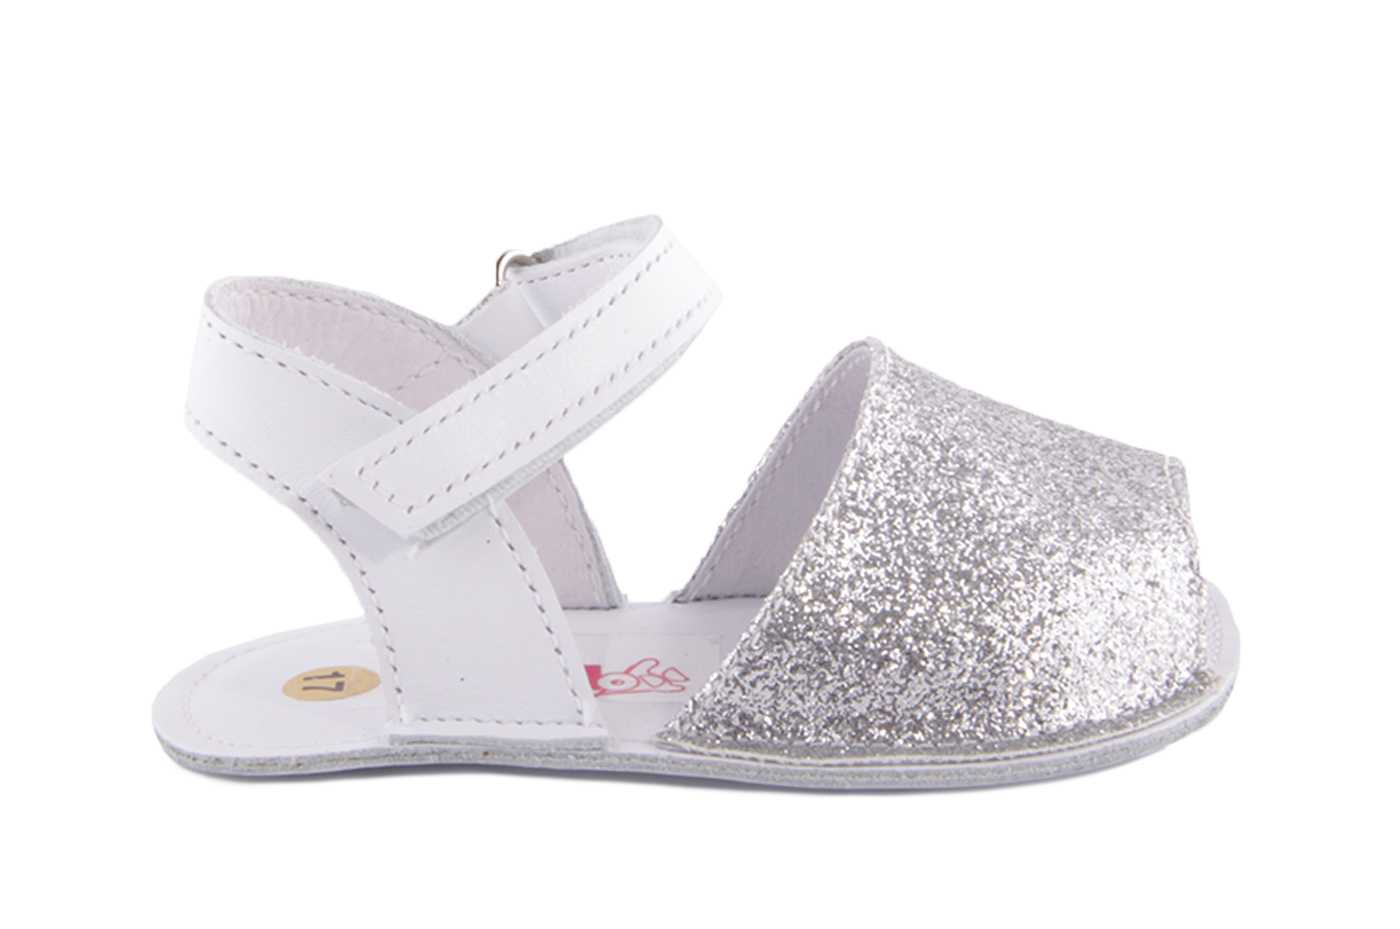 da2cfd0f9b Comprar zapato tipo BEBE NIÑA estilo SANDALIA COLOR PLATA PIEL ...